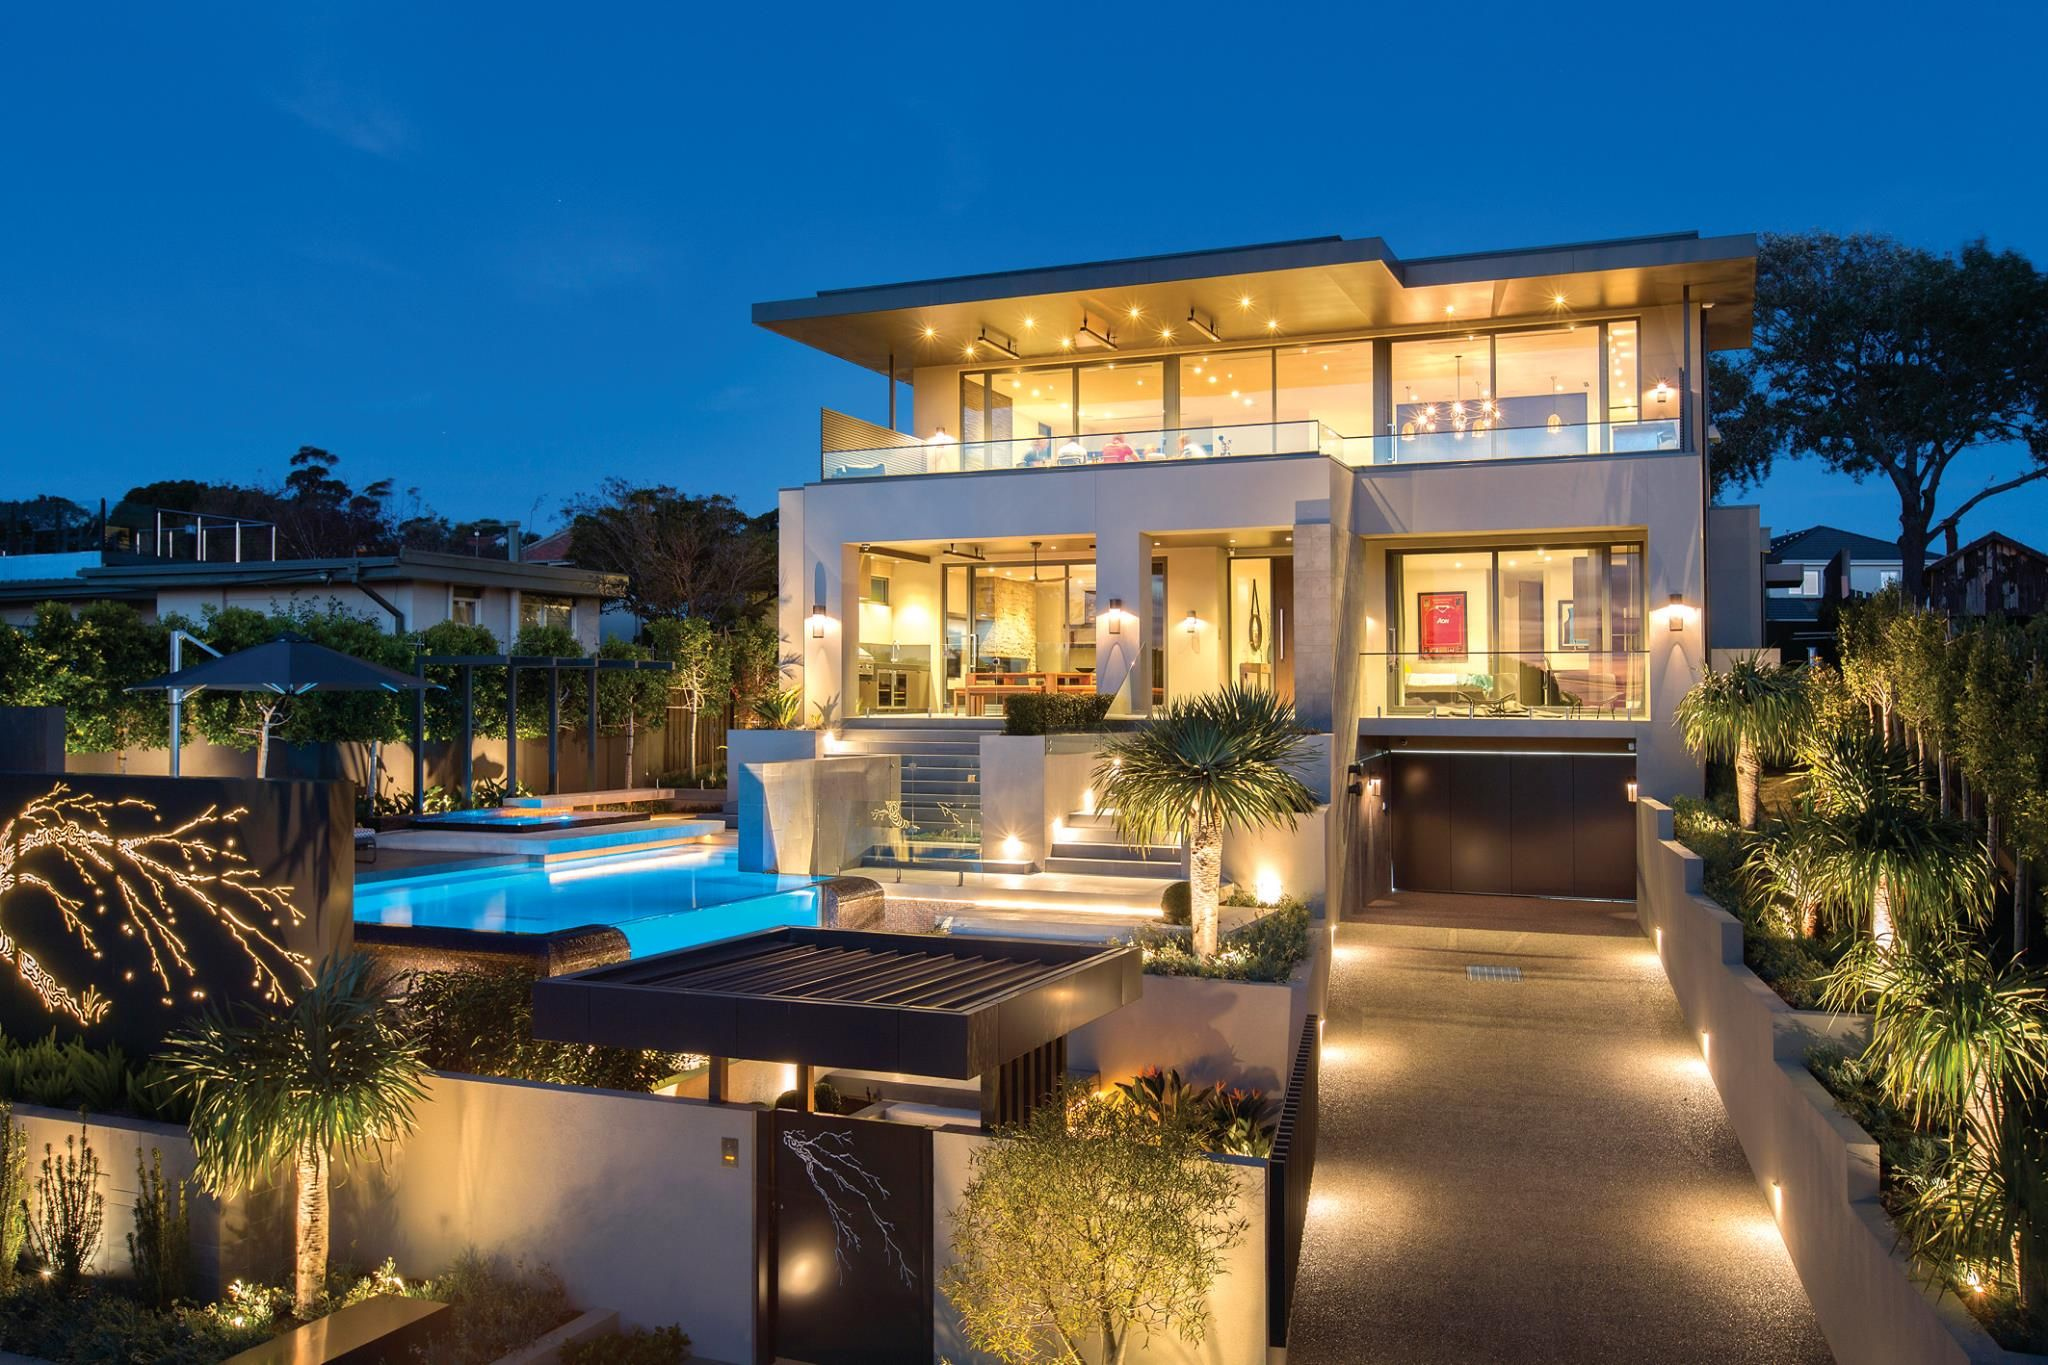 Bayside dream home on Burgess Street by COS Design - CAANdesign…